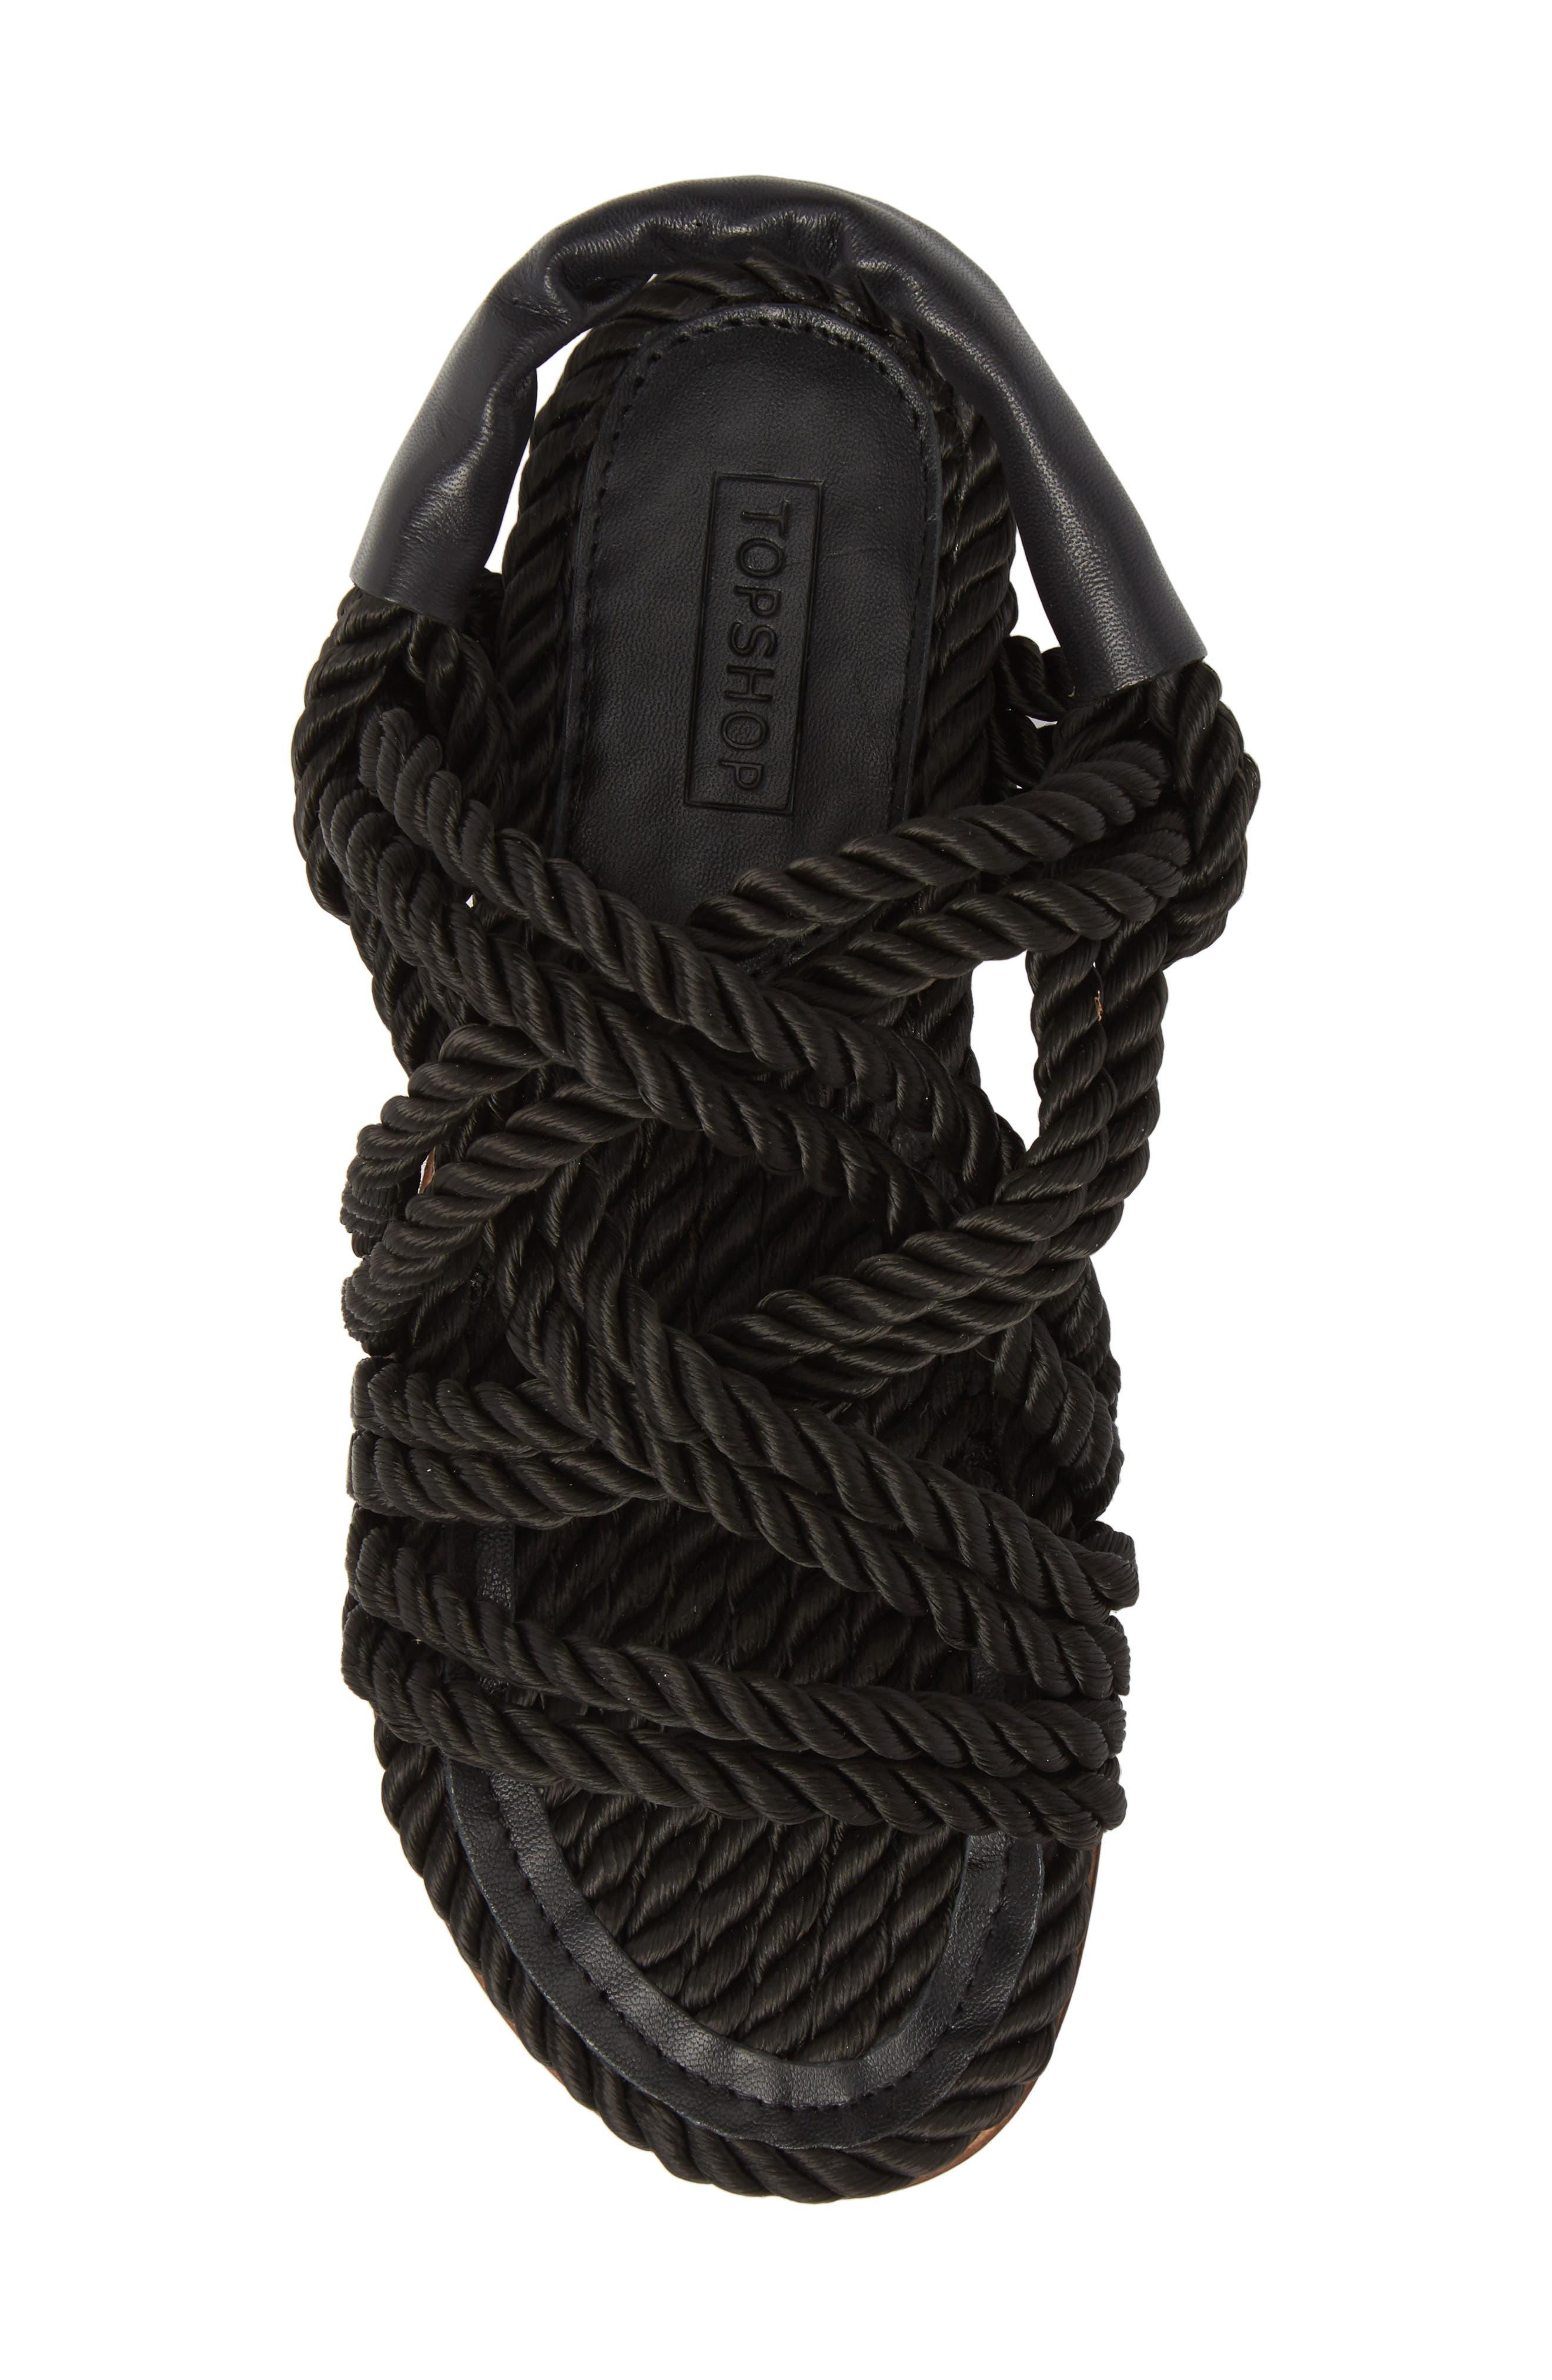 Fiesta Rope Flat Sandal,                             Alternate thumbnail 5, color,                             001